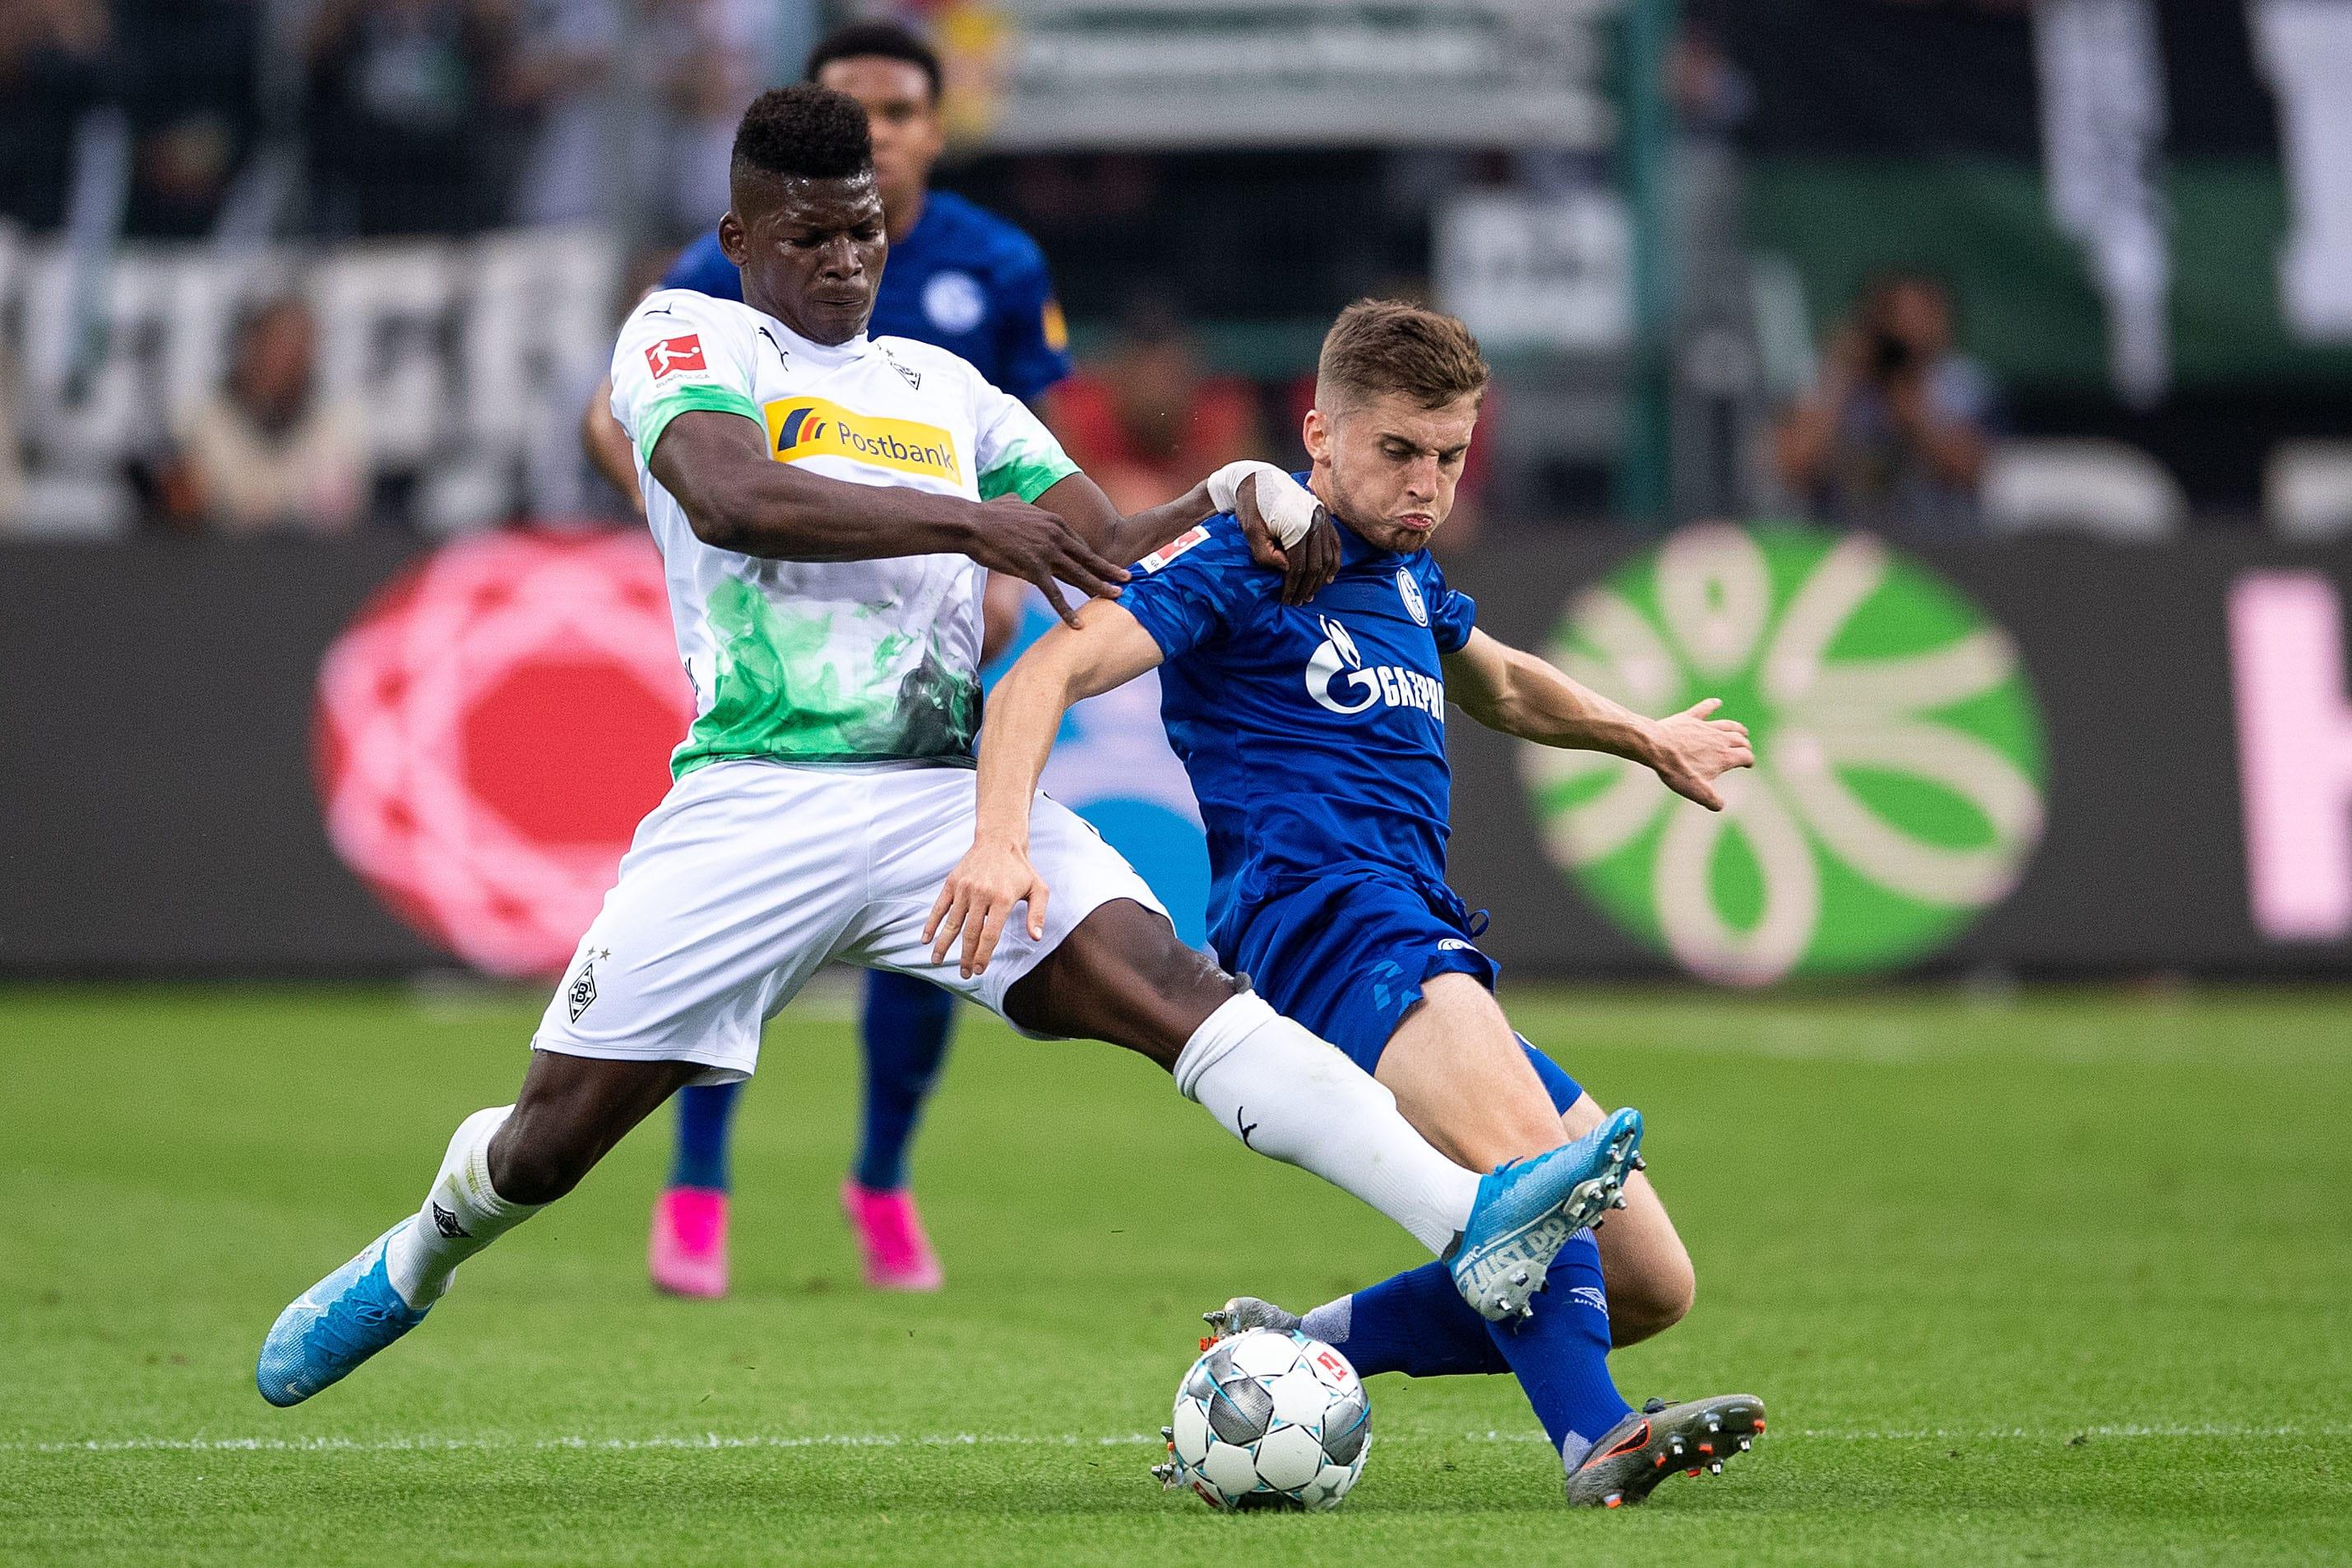 Schalke 04 vs Gladbach Free Betting Tips